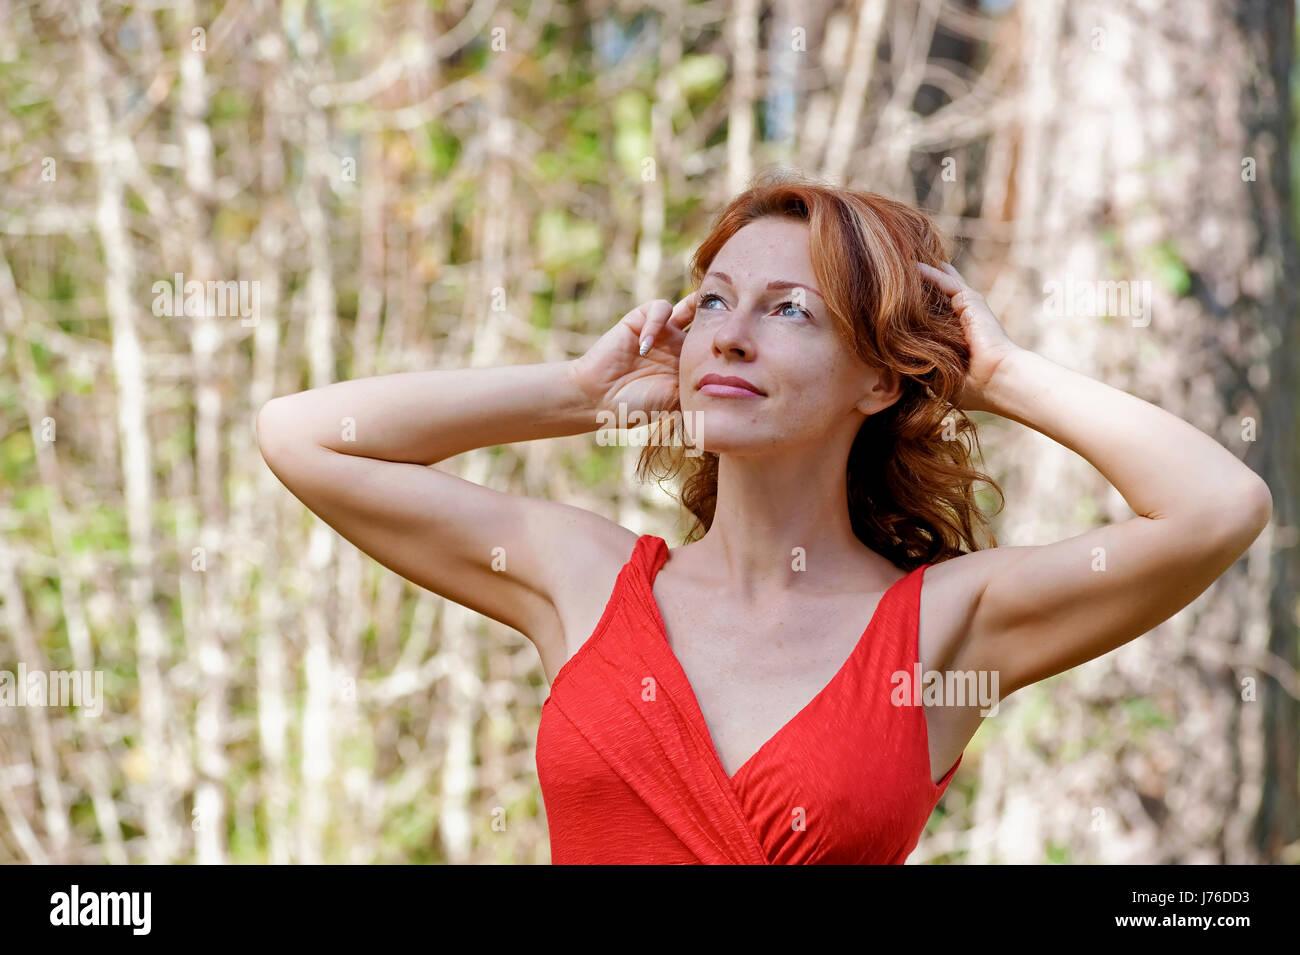 Adult female mature photo